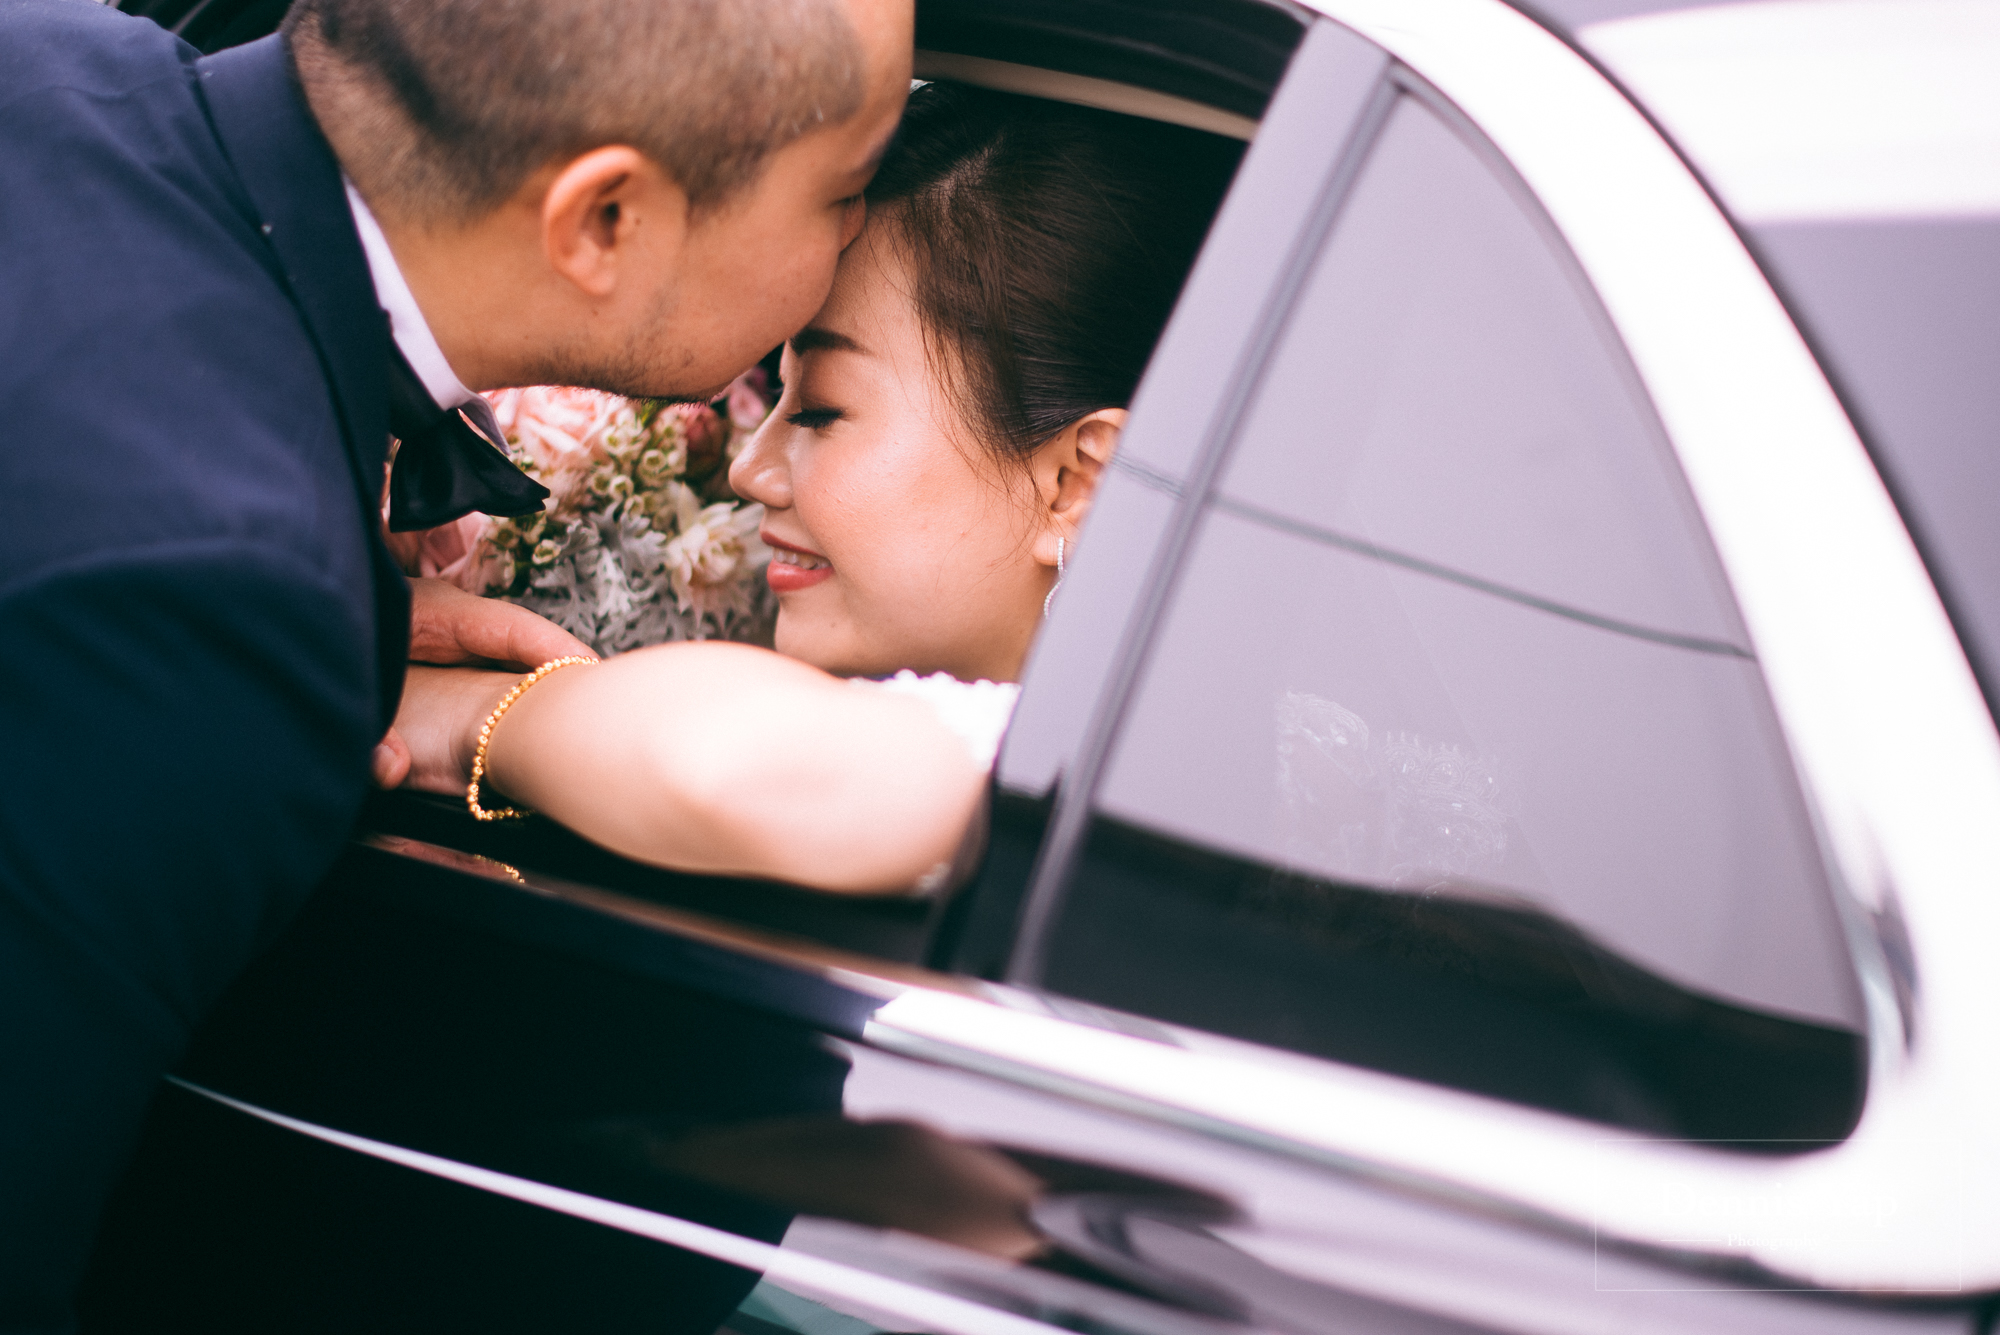 we chard sharon wedding day gate crash majestic hotel kuala lumpur moonlight dennis yap photography malaysia-25.jpg